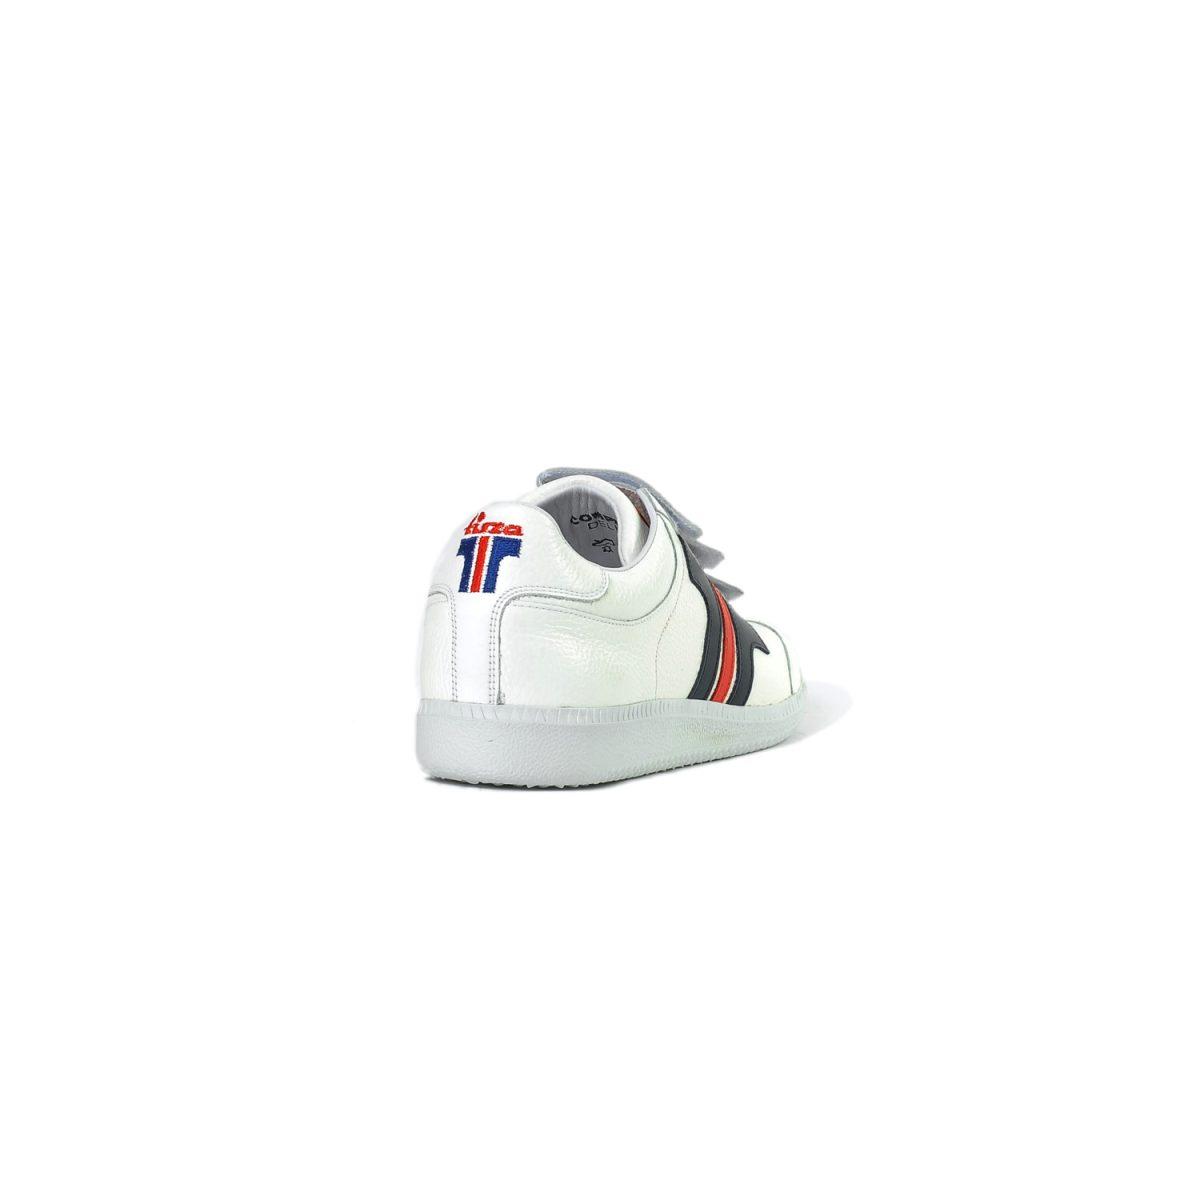 Tisza shoes - Delux - White-classic